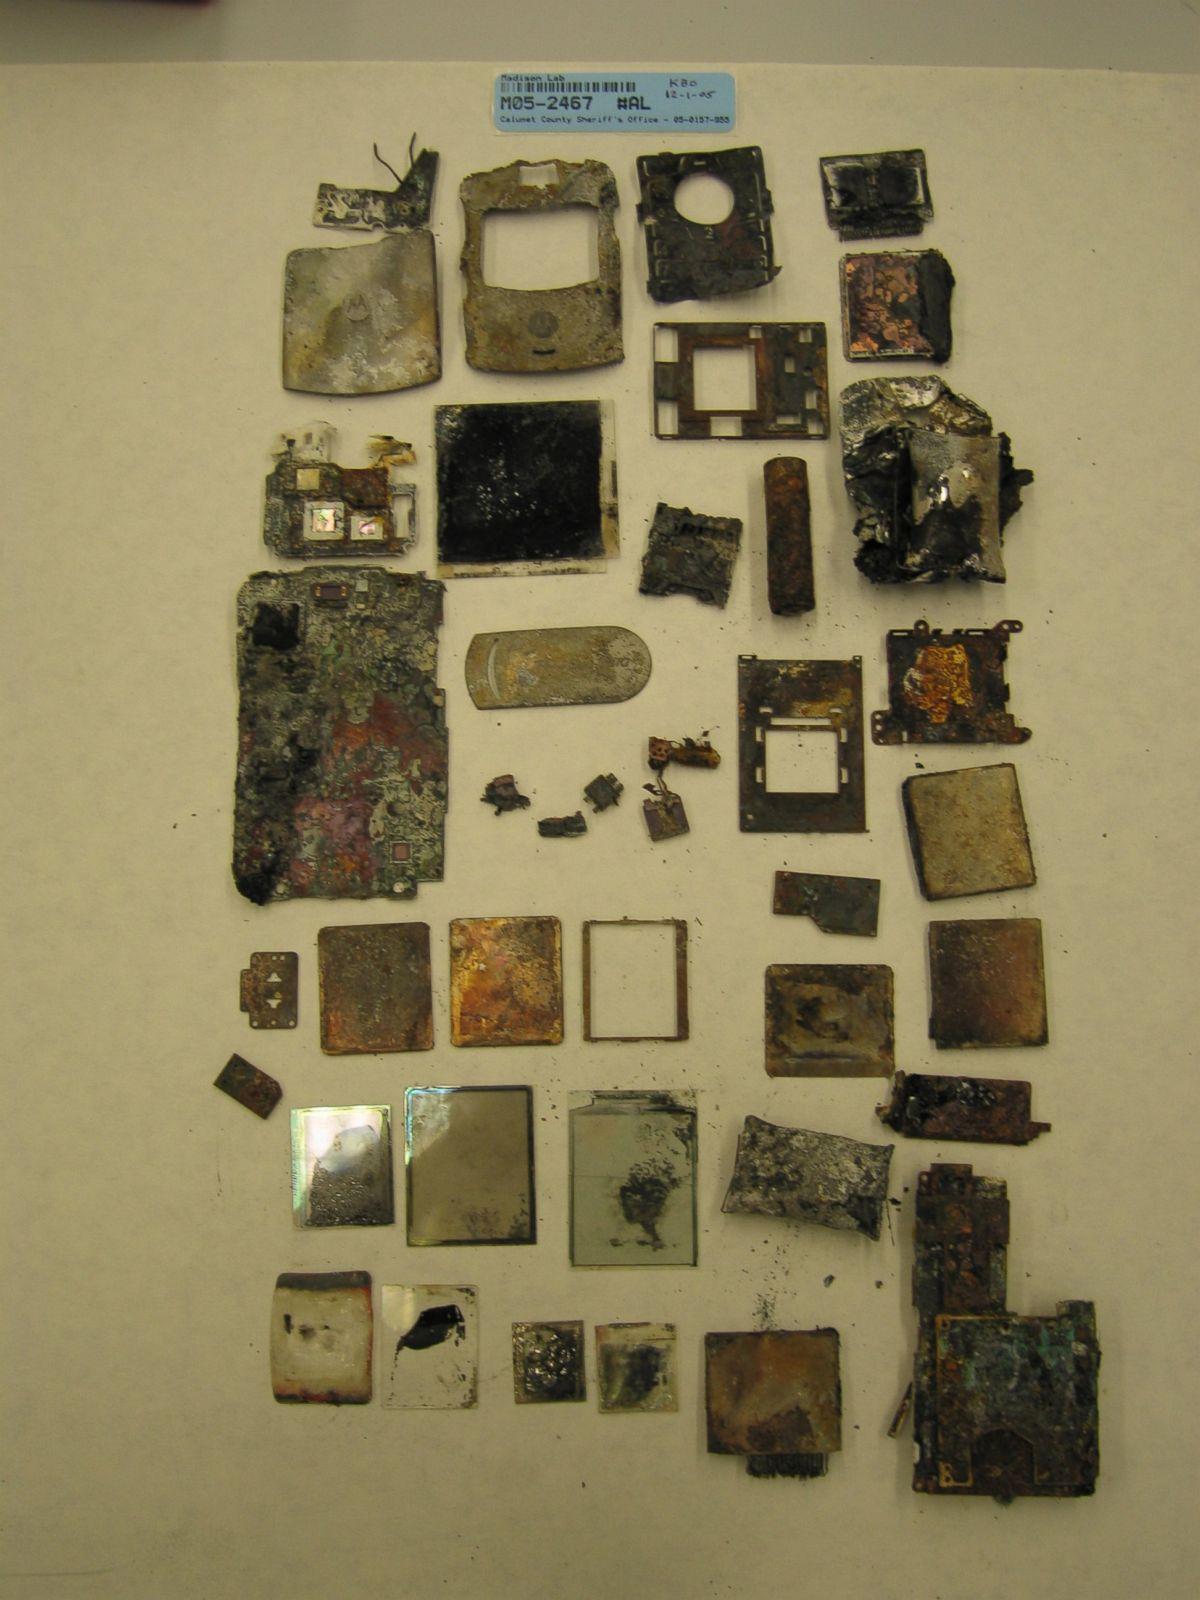 exhibit-burnt-cell-phone